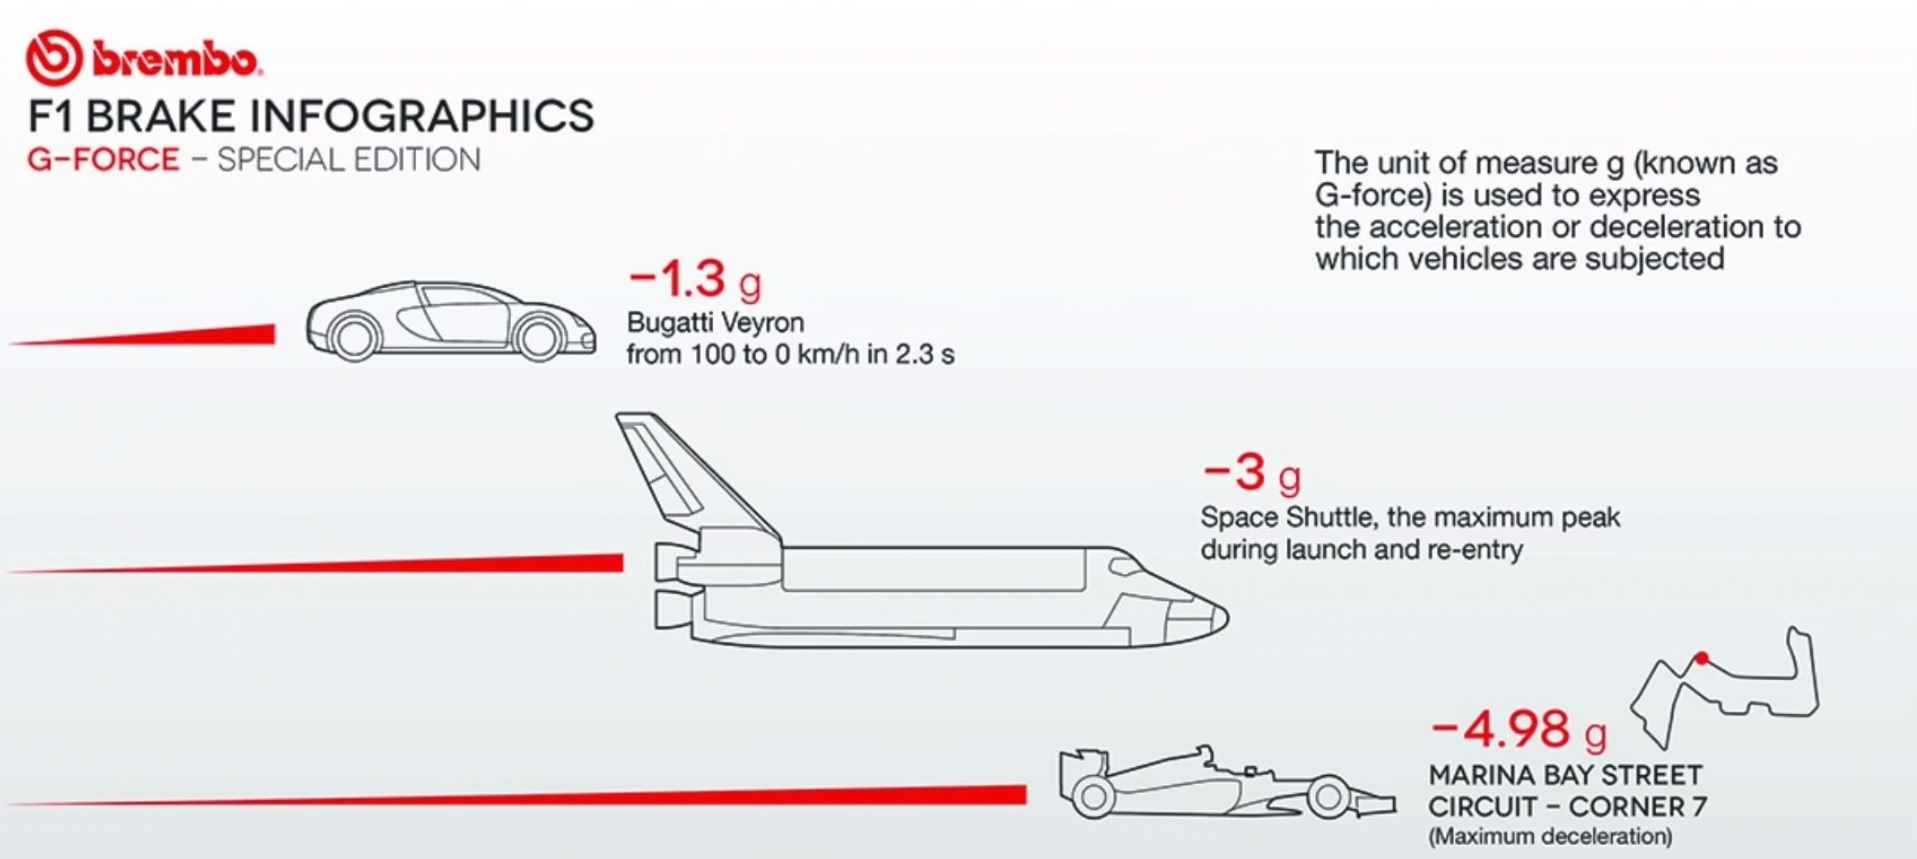 Как работают тормоза болида Формулы-1: с 320 до 0 км/ч – 4 секунды